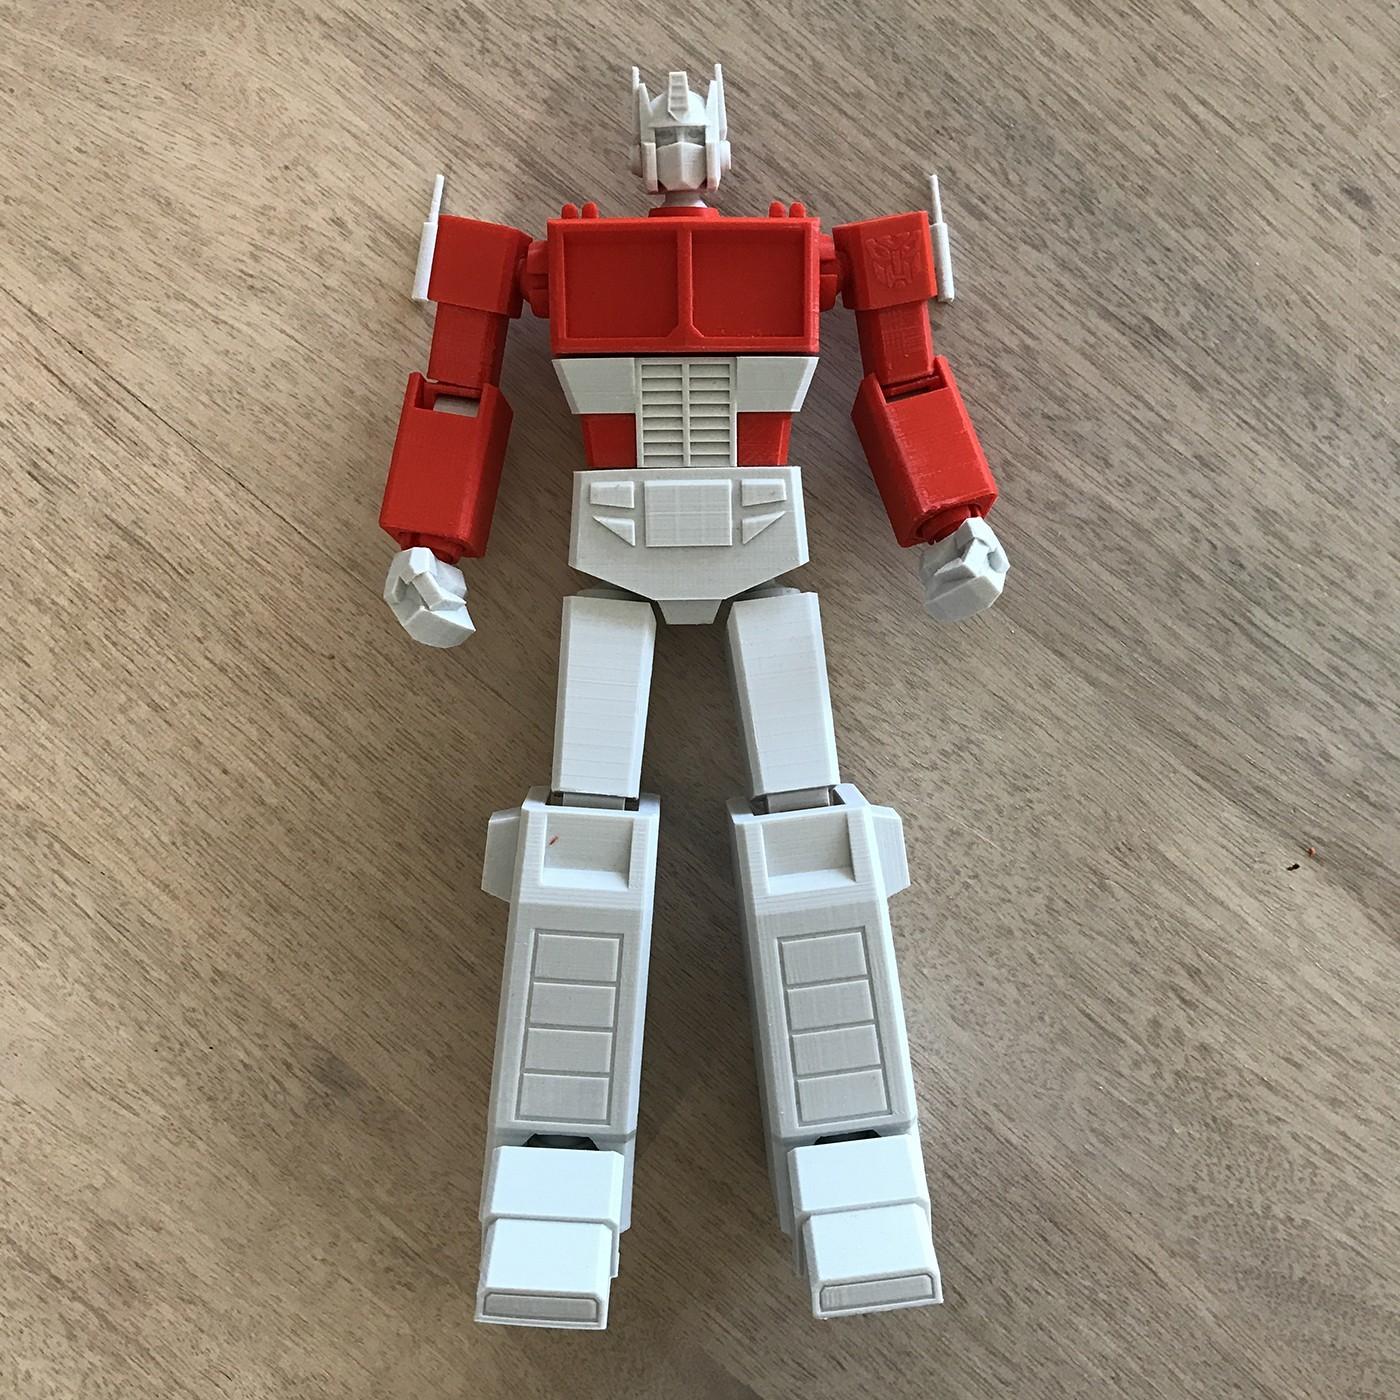 01.jpg Download STL file Low Poly Optimus Prime • Model to 3D print, biglildesign